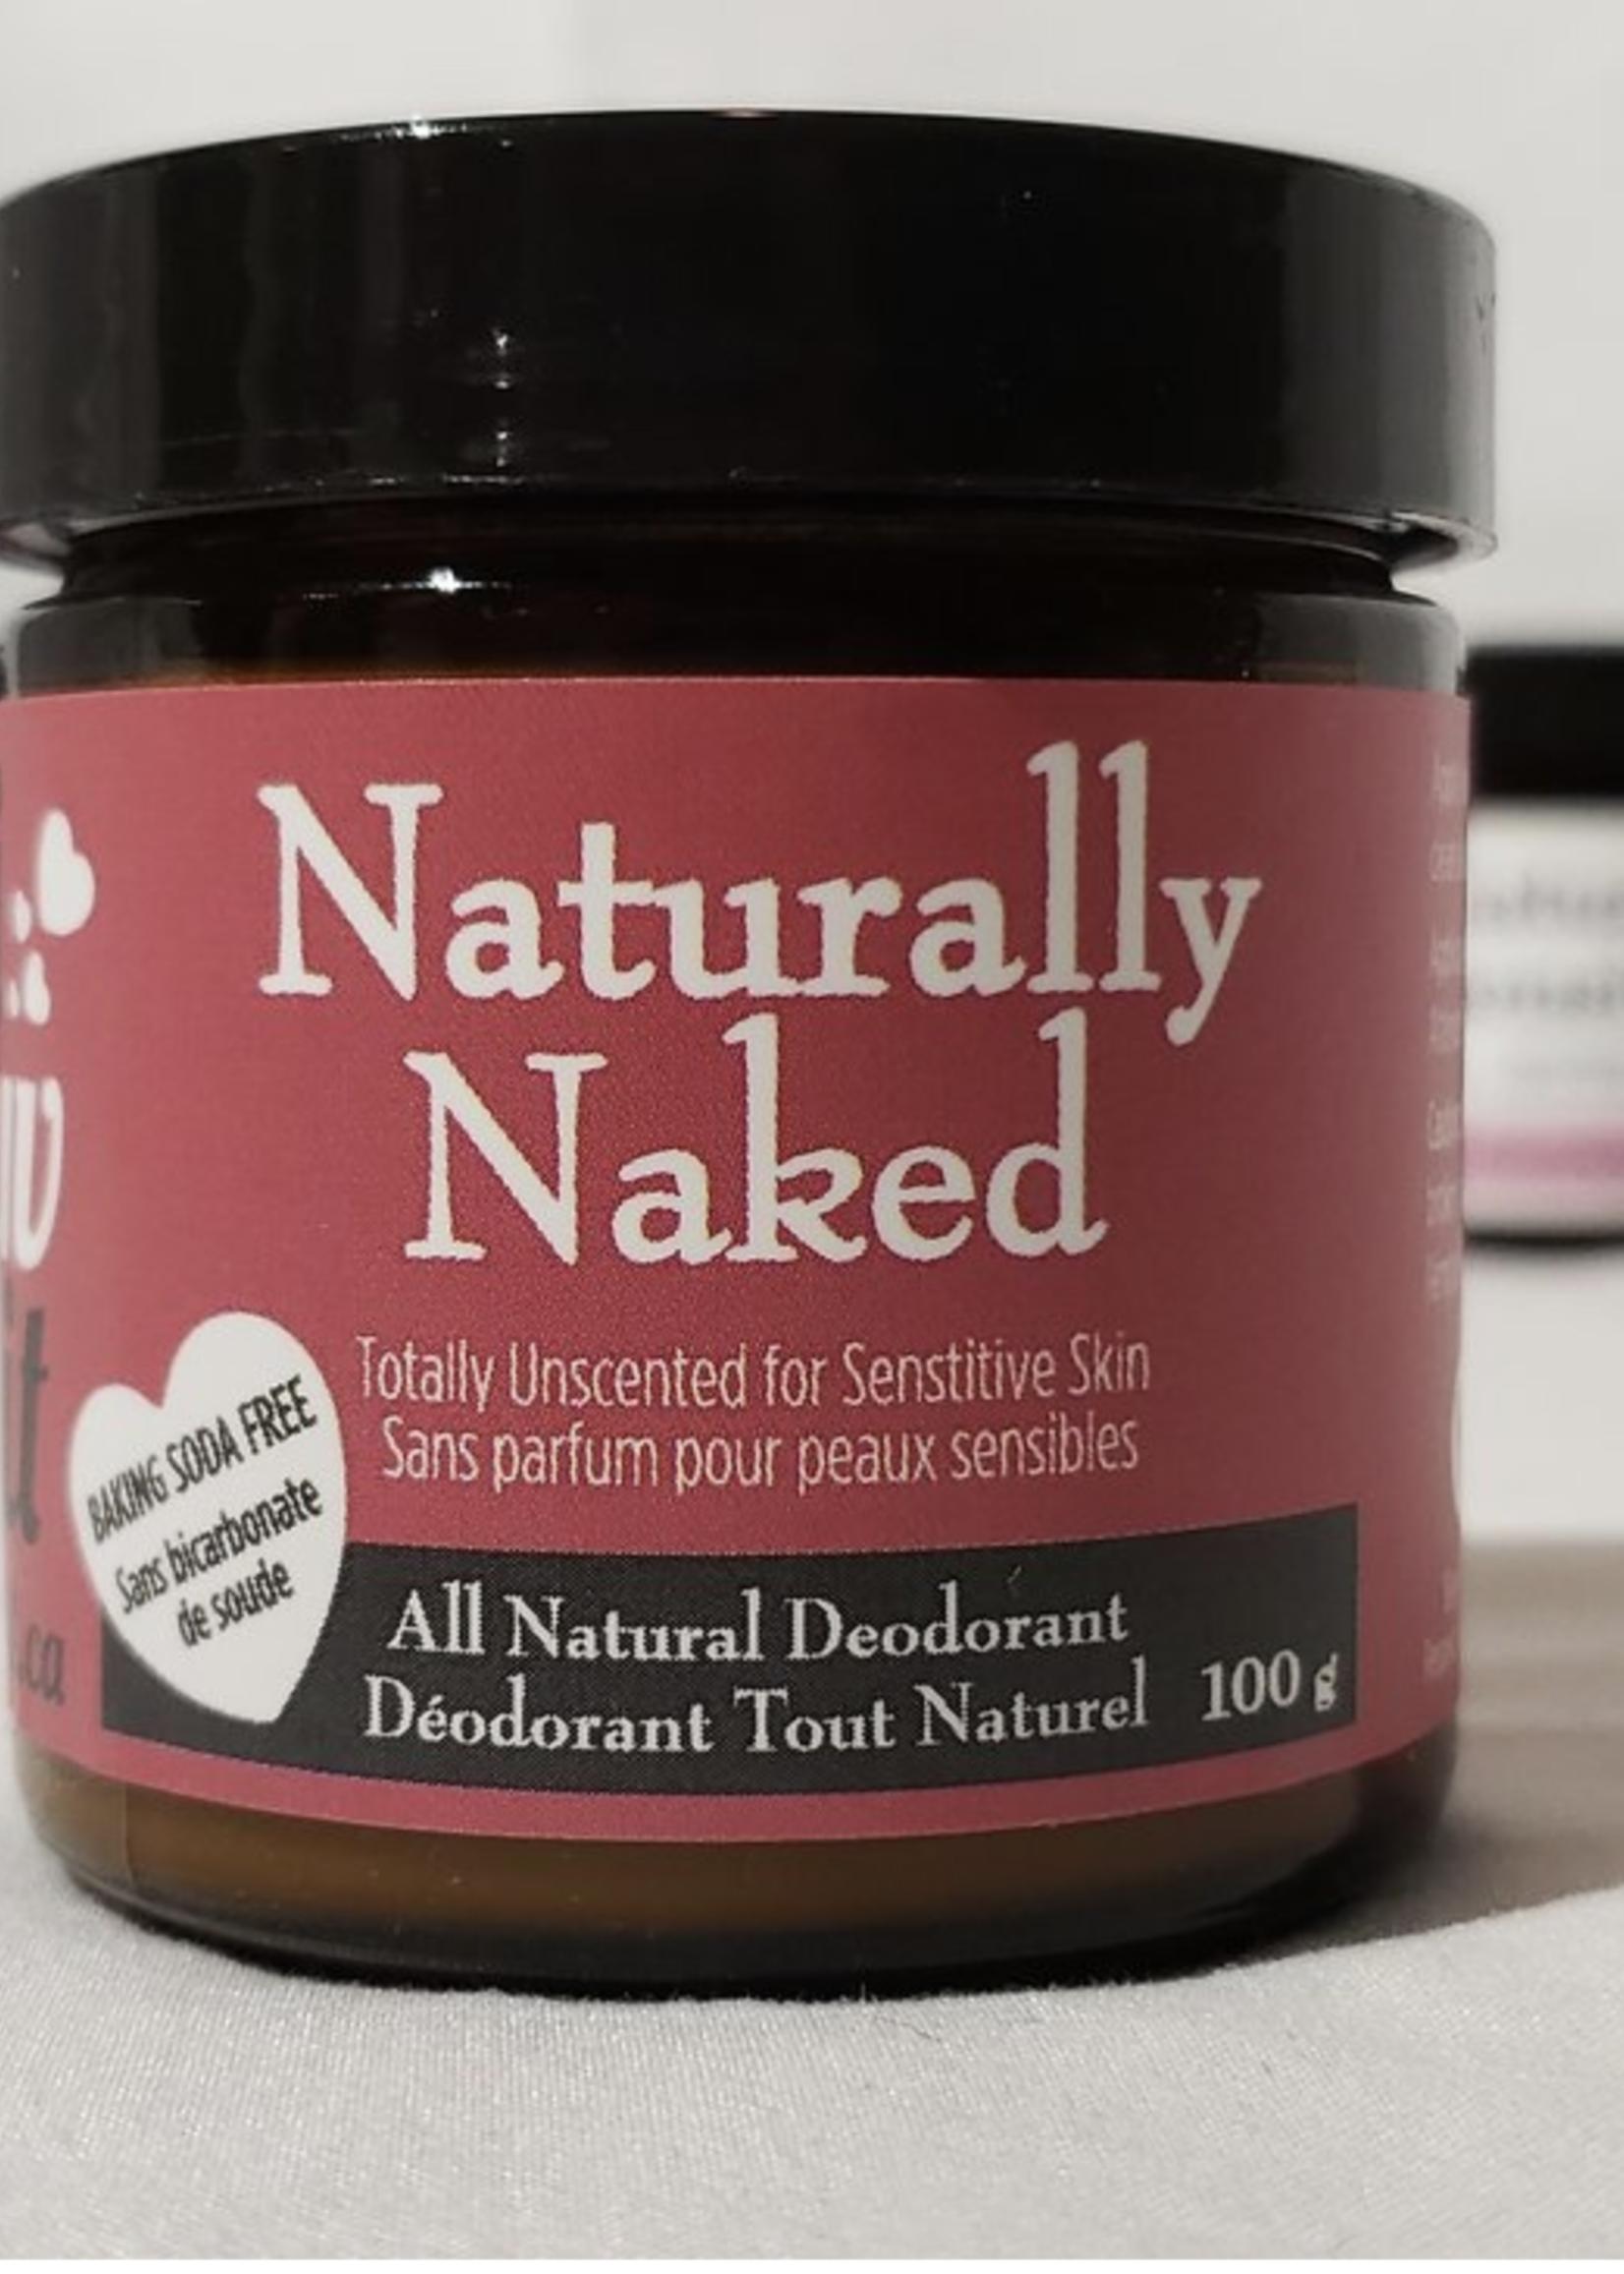 I Luv It Deodorant Naturally Naked Deodorant